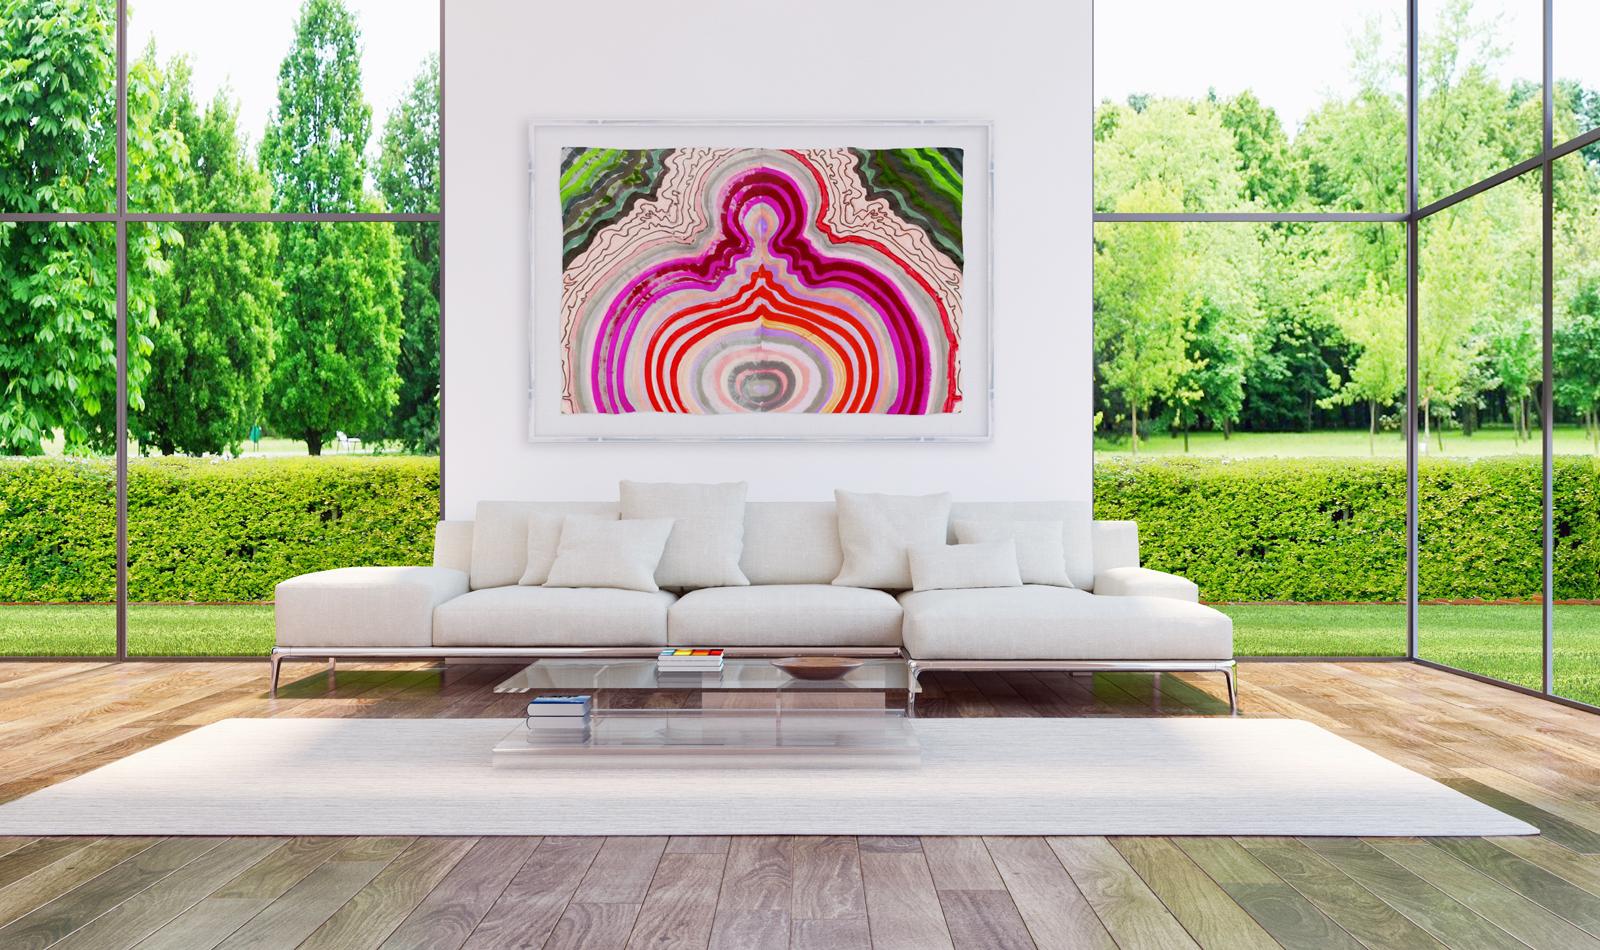 Kristi-Kohut-art-homes-colorful890.jpg